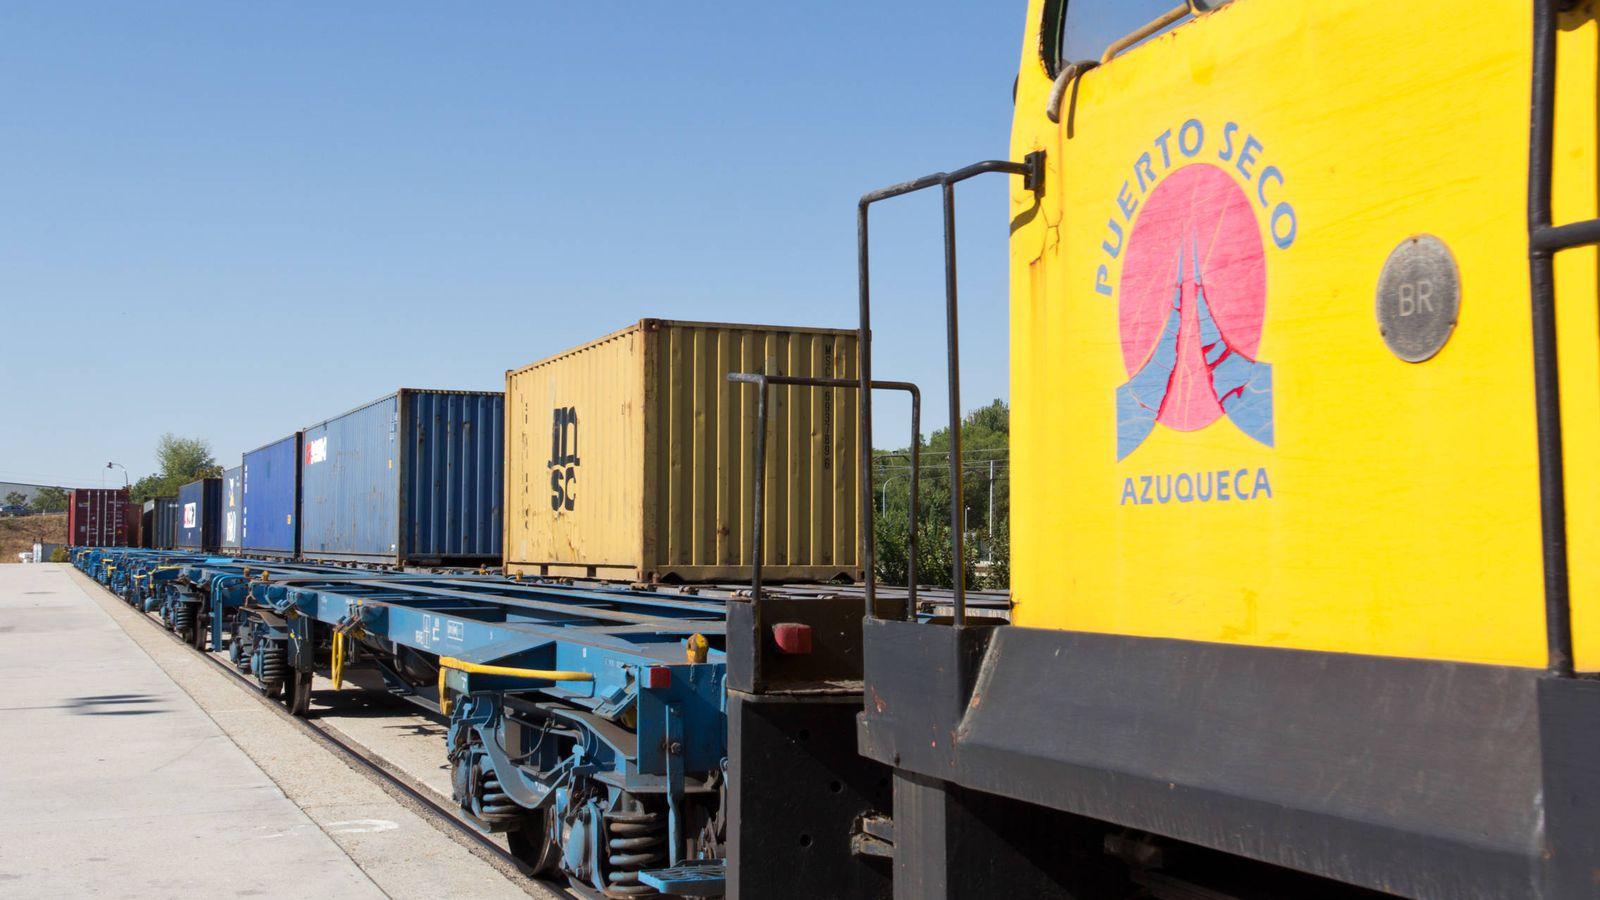 Foto: Ferrocarril del Puerto Seco de Azuqueca de Henares. (Terminal Intermodal Centro)